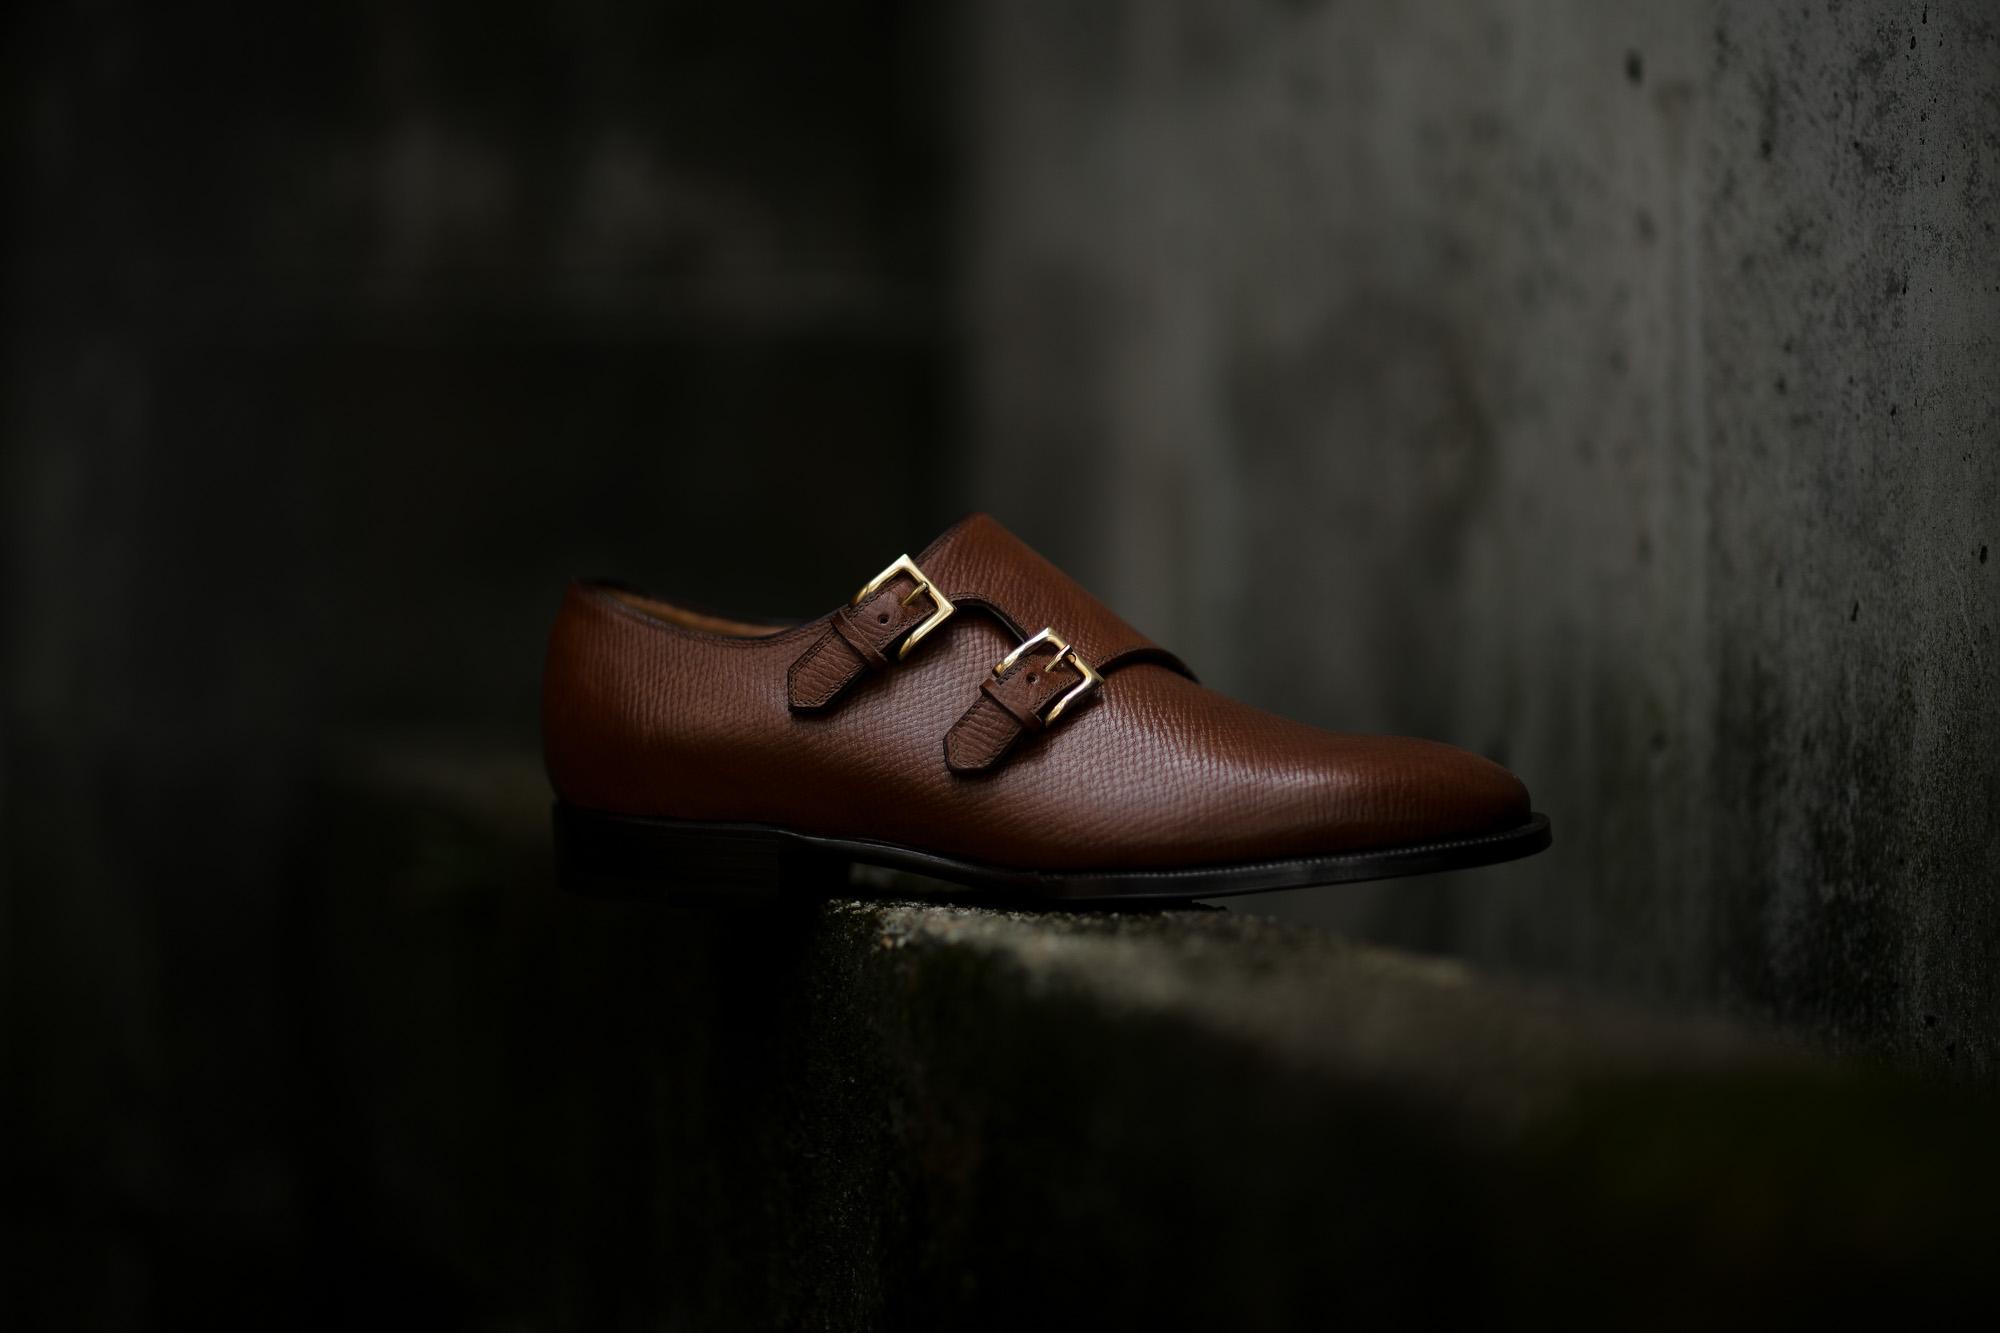 ENZO BONAFE(エンツォボナフェ) EB-36 Double Monk Strap Shoes INCA Leather ダブルモンクストラップシューズ NERO (ブラック) made in italy (イタリア製) 2018 秋冬 【Special Model】【ご予約受付中】enzobonafe eb36 ダブルモンク 愛知 名古屋 Alto e Diritto アルト エ デリット ダブモン